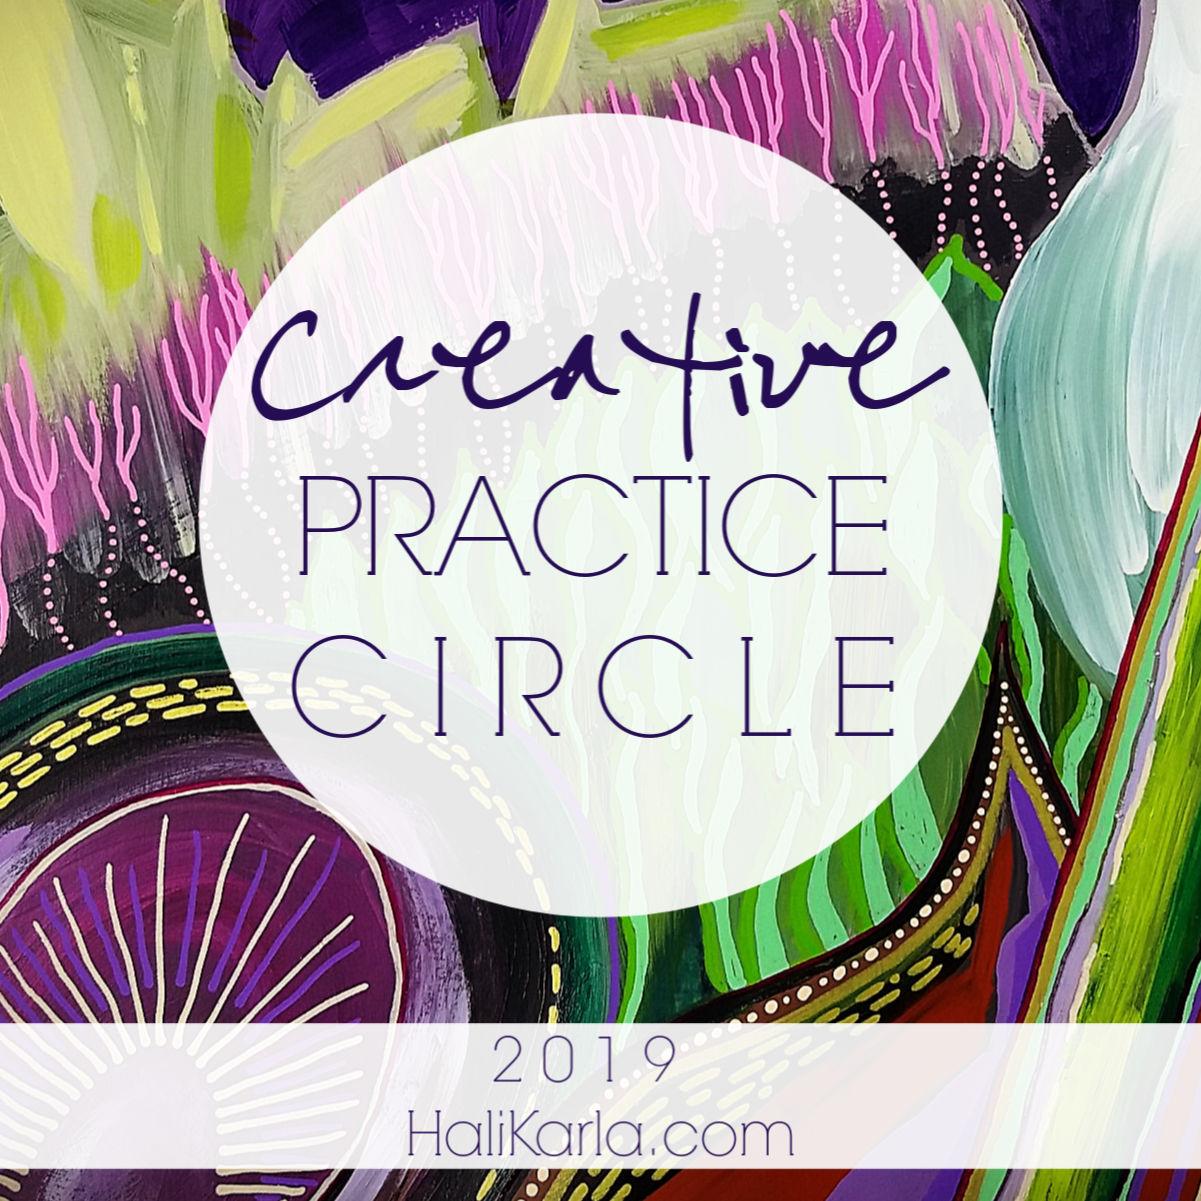 Creative Practice Circle community with Hali Karla Arts